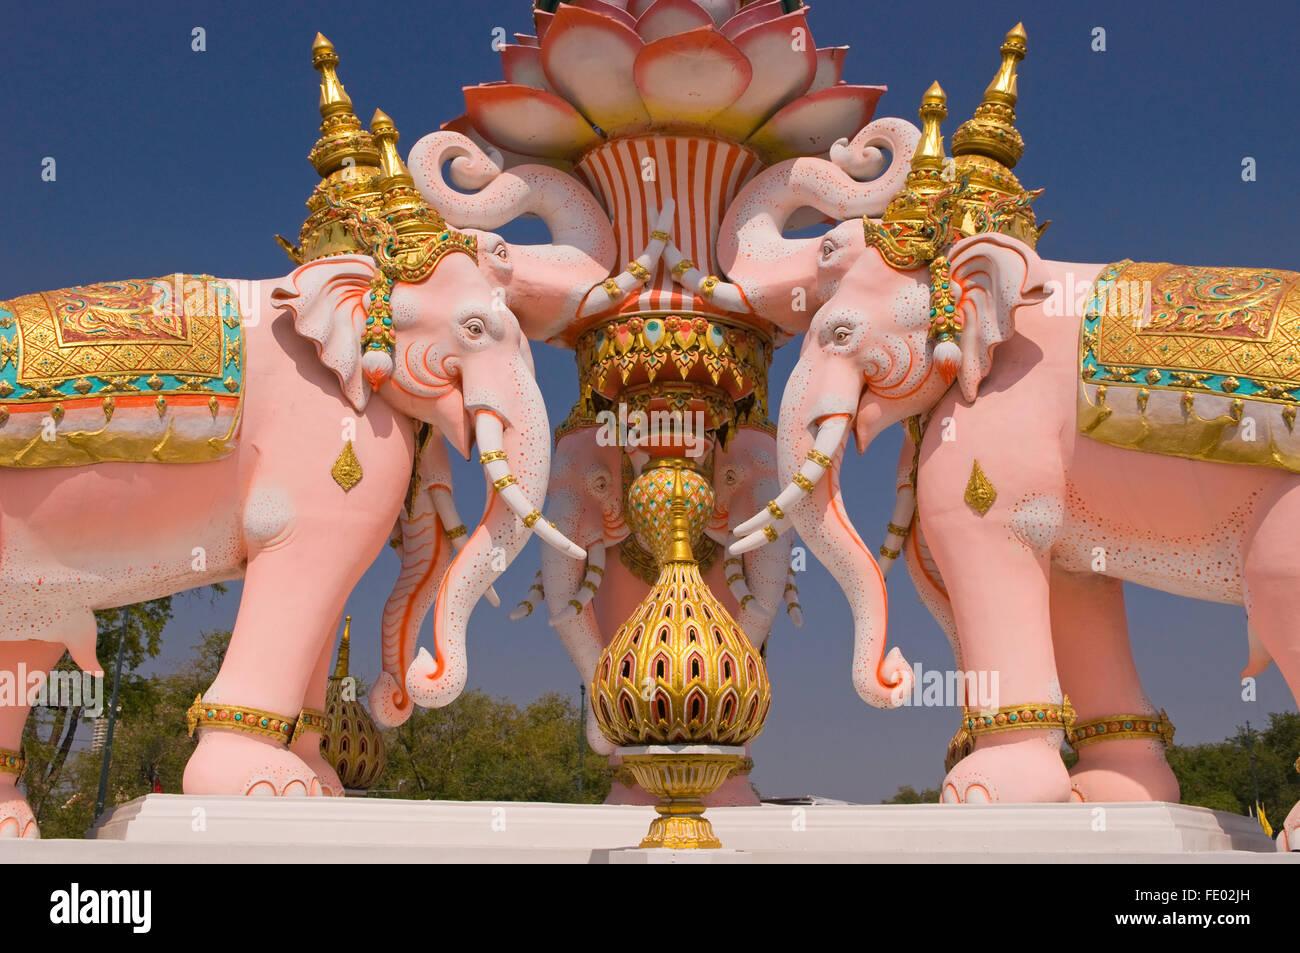 Ornamental pink elephants in Bangkok, Thailand - Stock Image